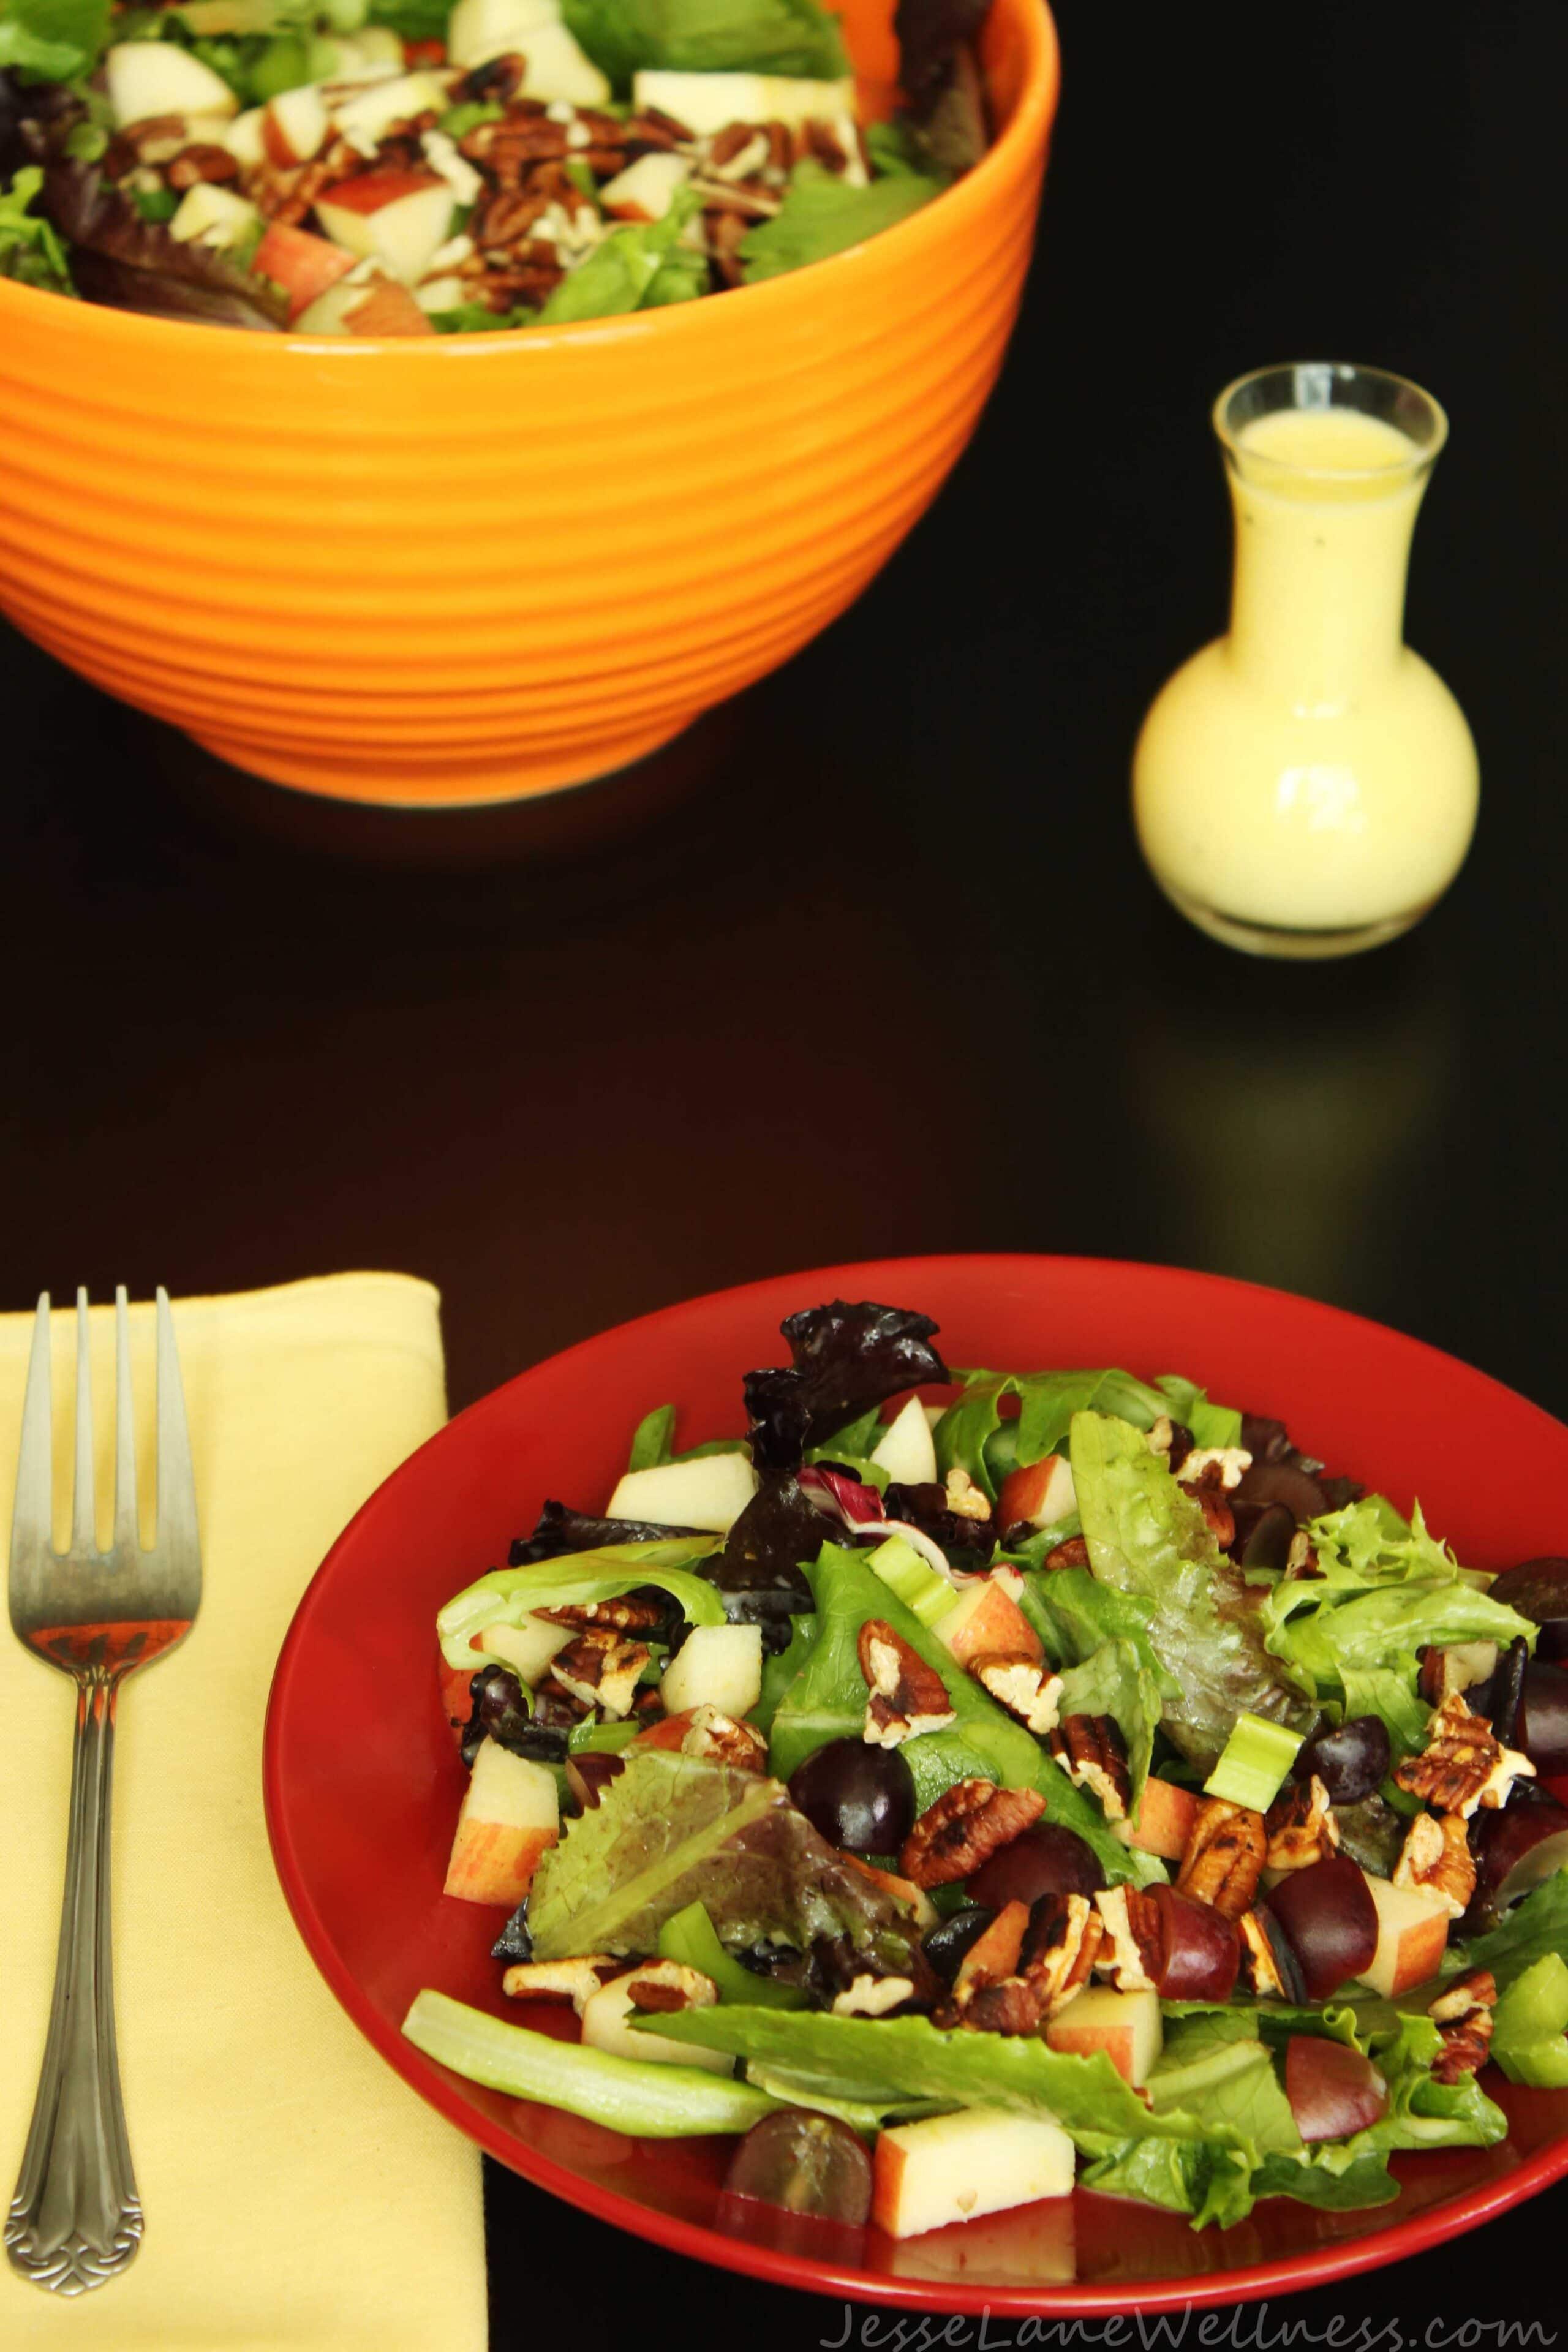 Leafy Waldorf Salad by @JesseLWellness #salad